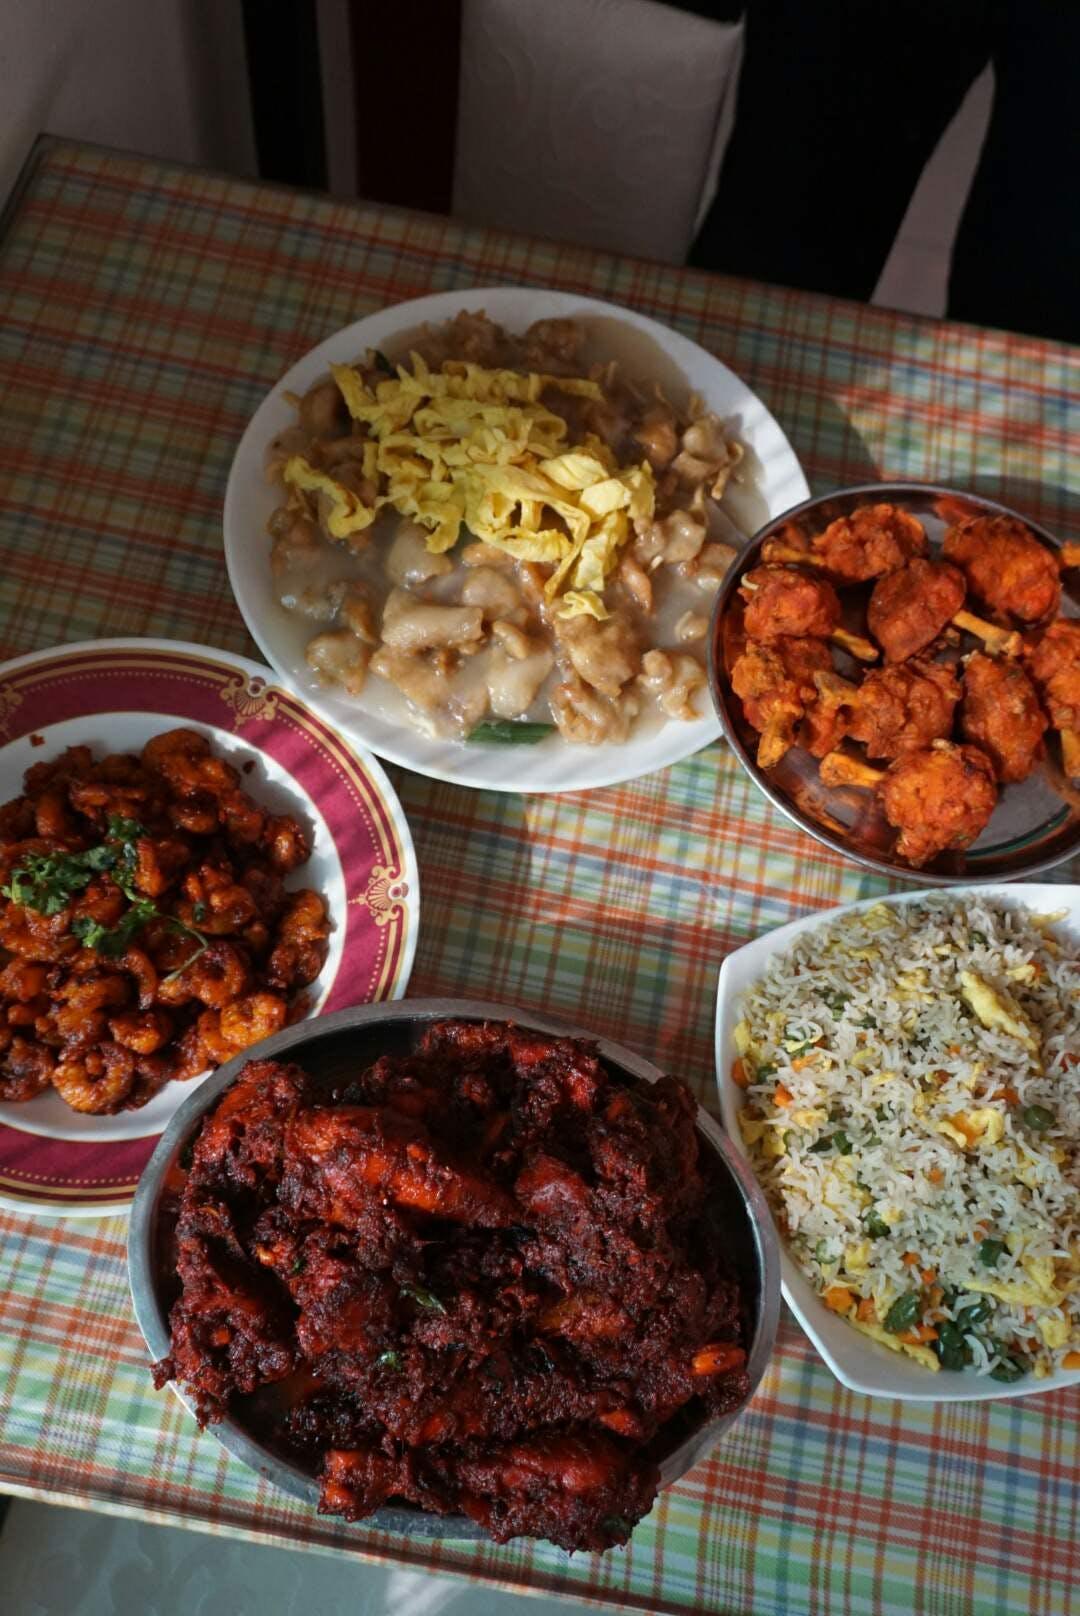 Dish,Food,Cuisine,Ingredient,Meal,Produce,Comfort food,Staple food,Recipe,Fried food